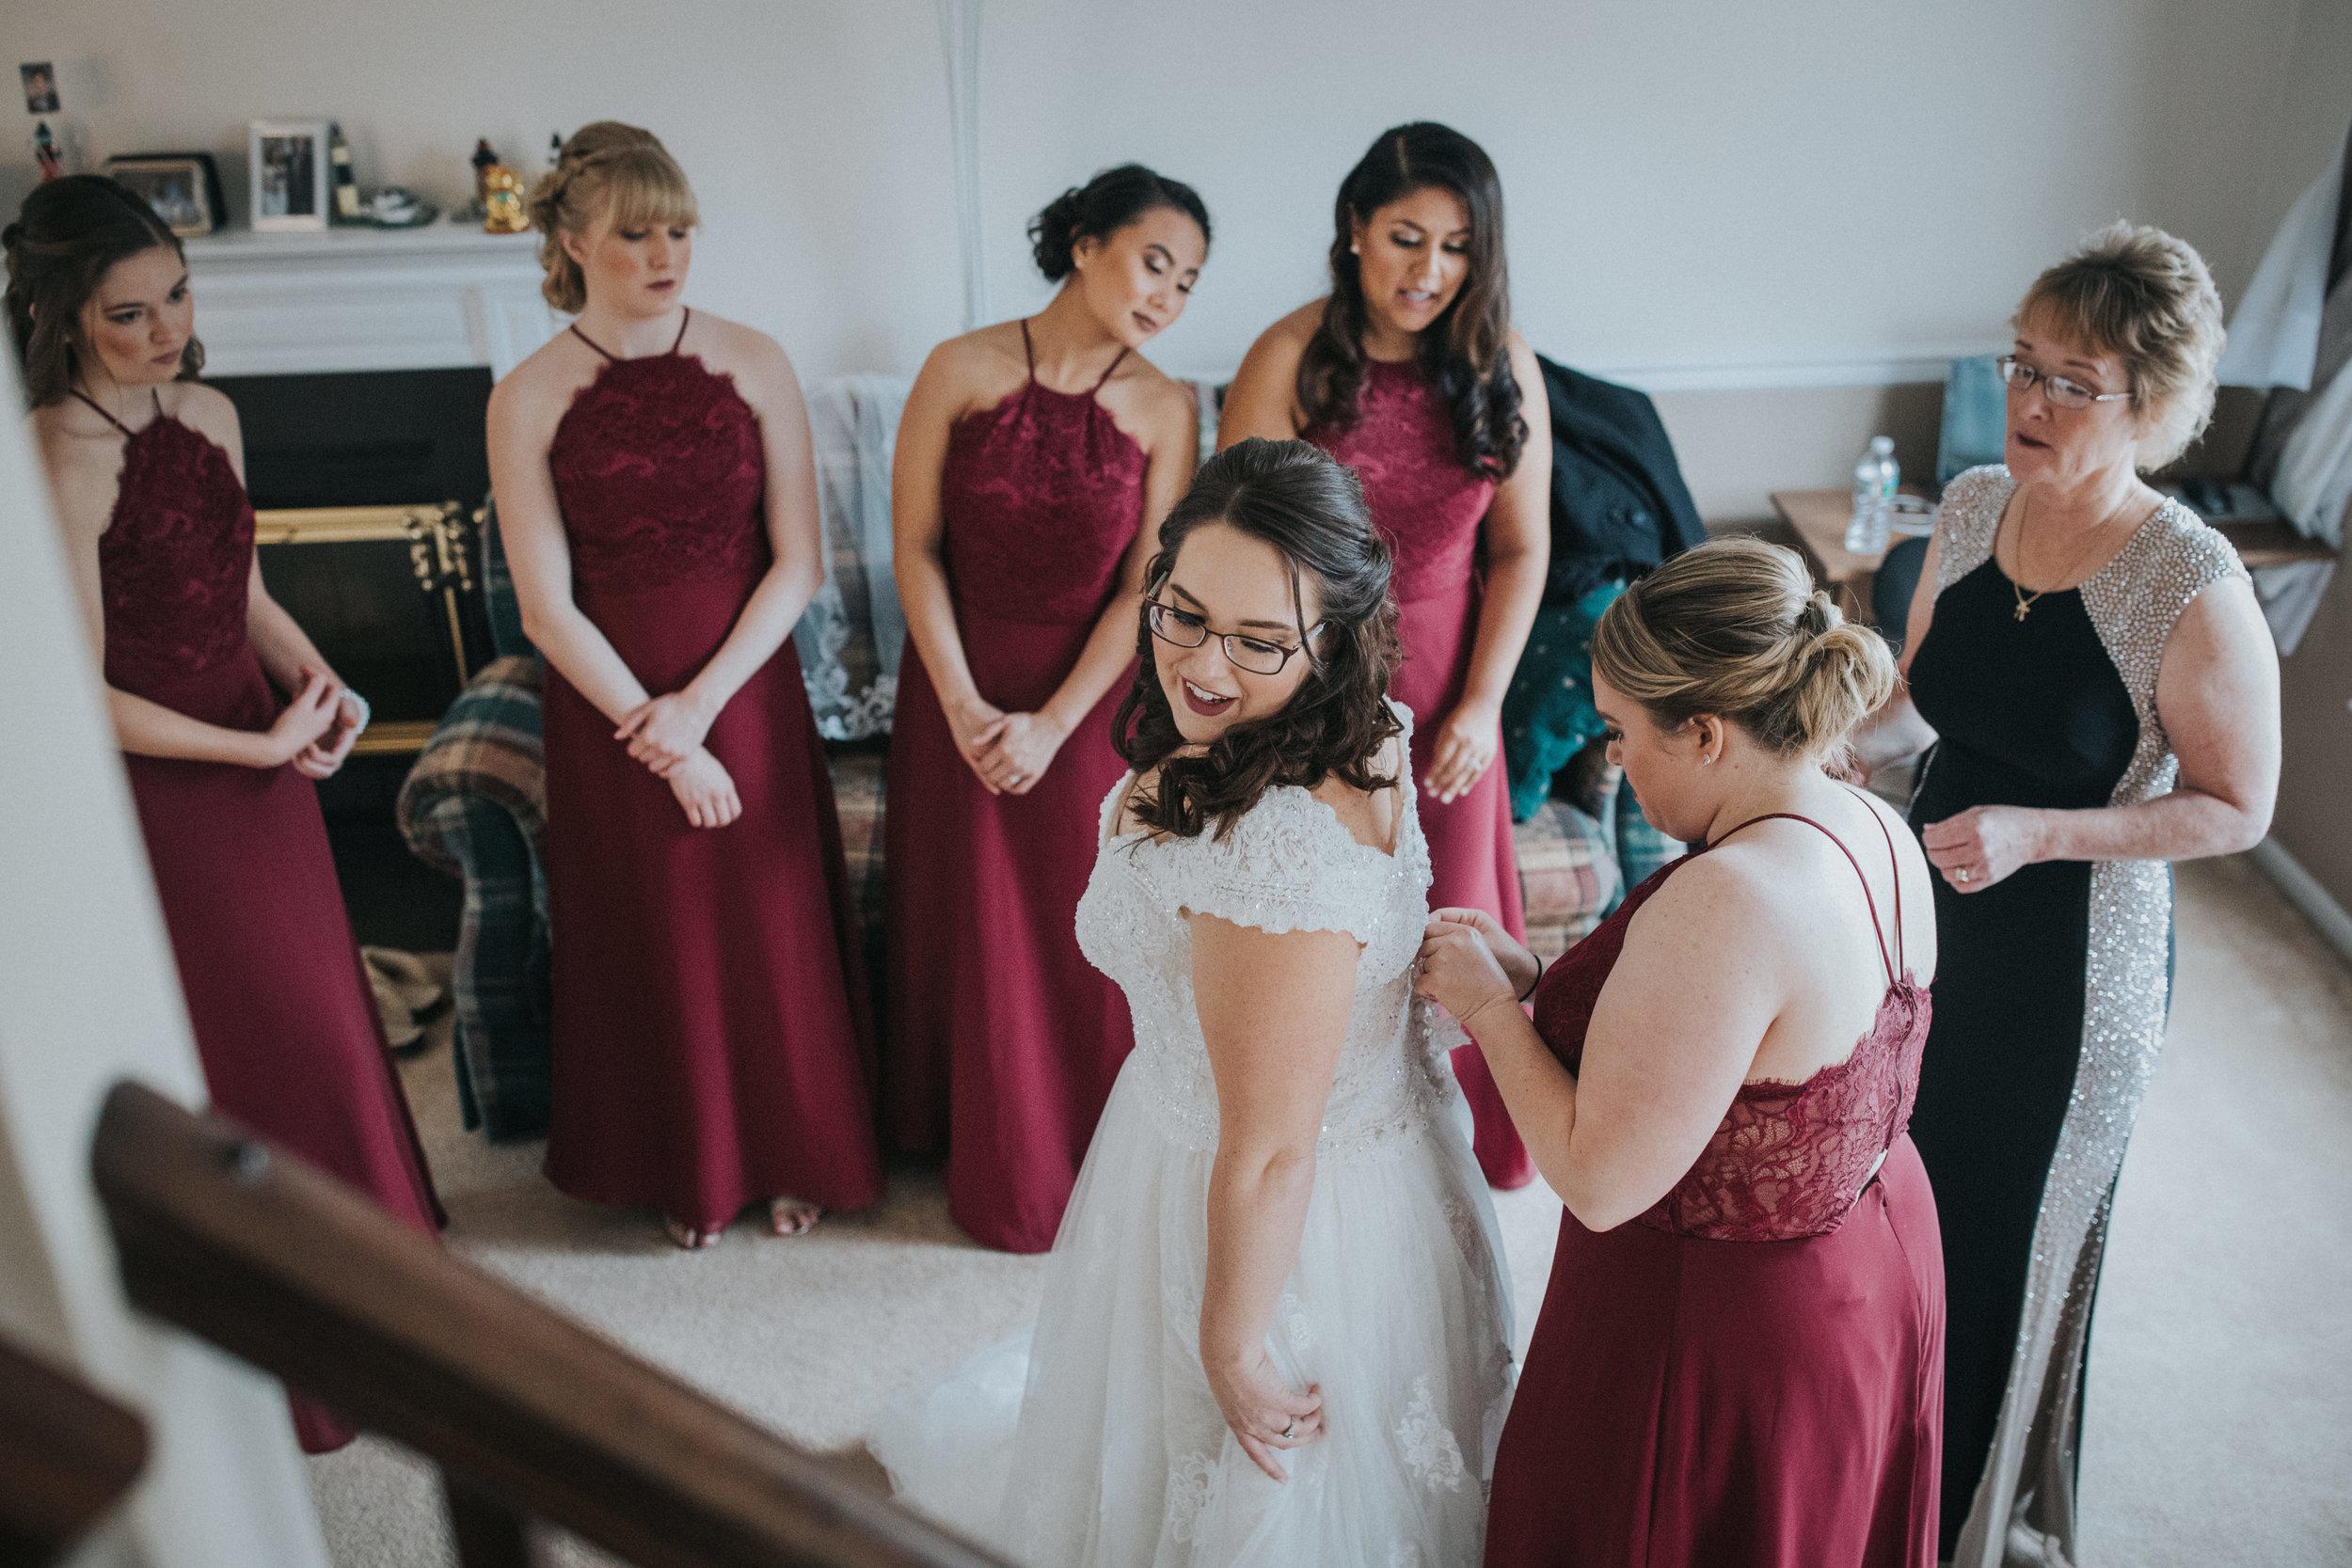 New-Jersey-Wedding-Photography-Fishers-Tudor-House-JennaLynnPhotography-Getting-Ready-Kathleen&Eddie-57.jpg